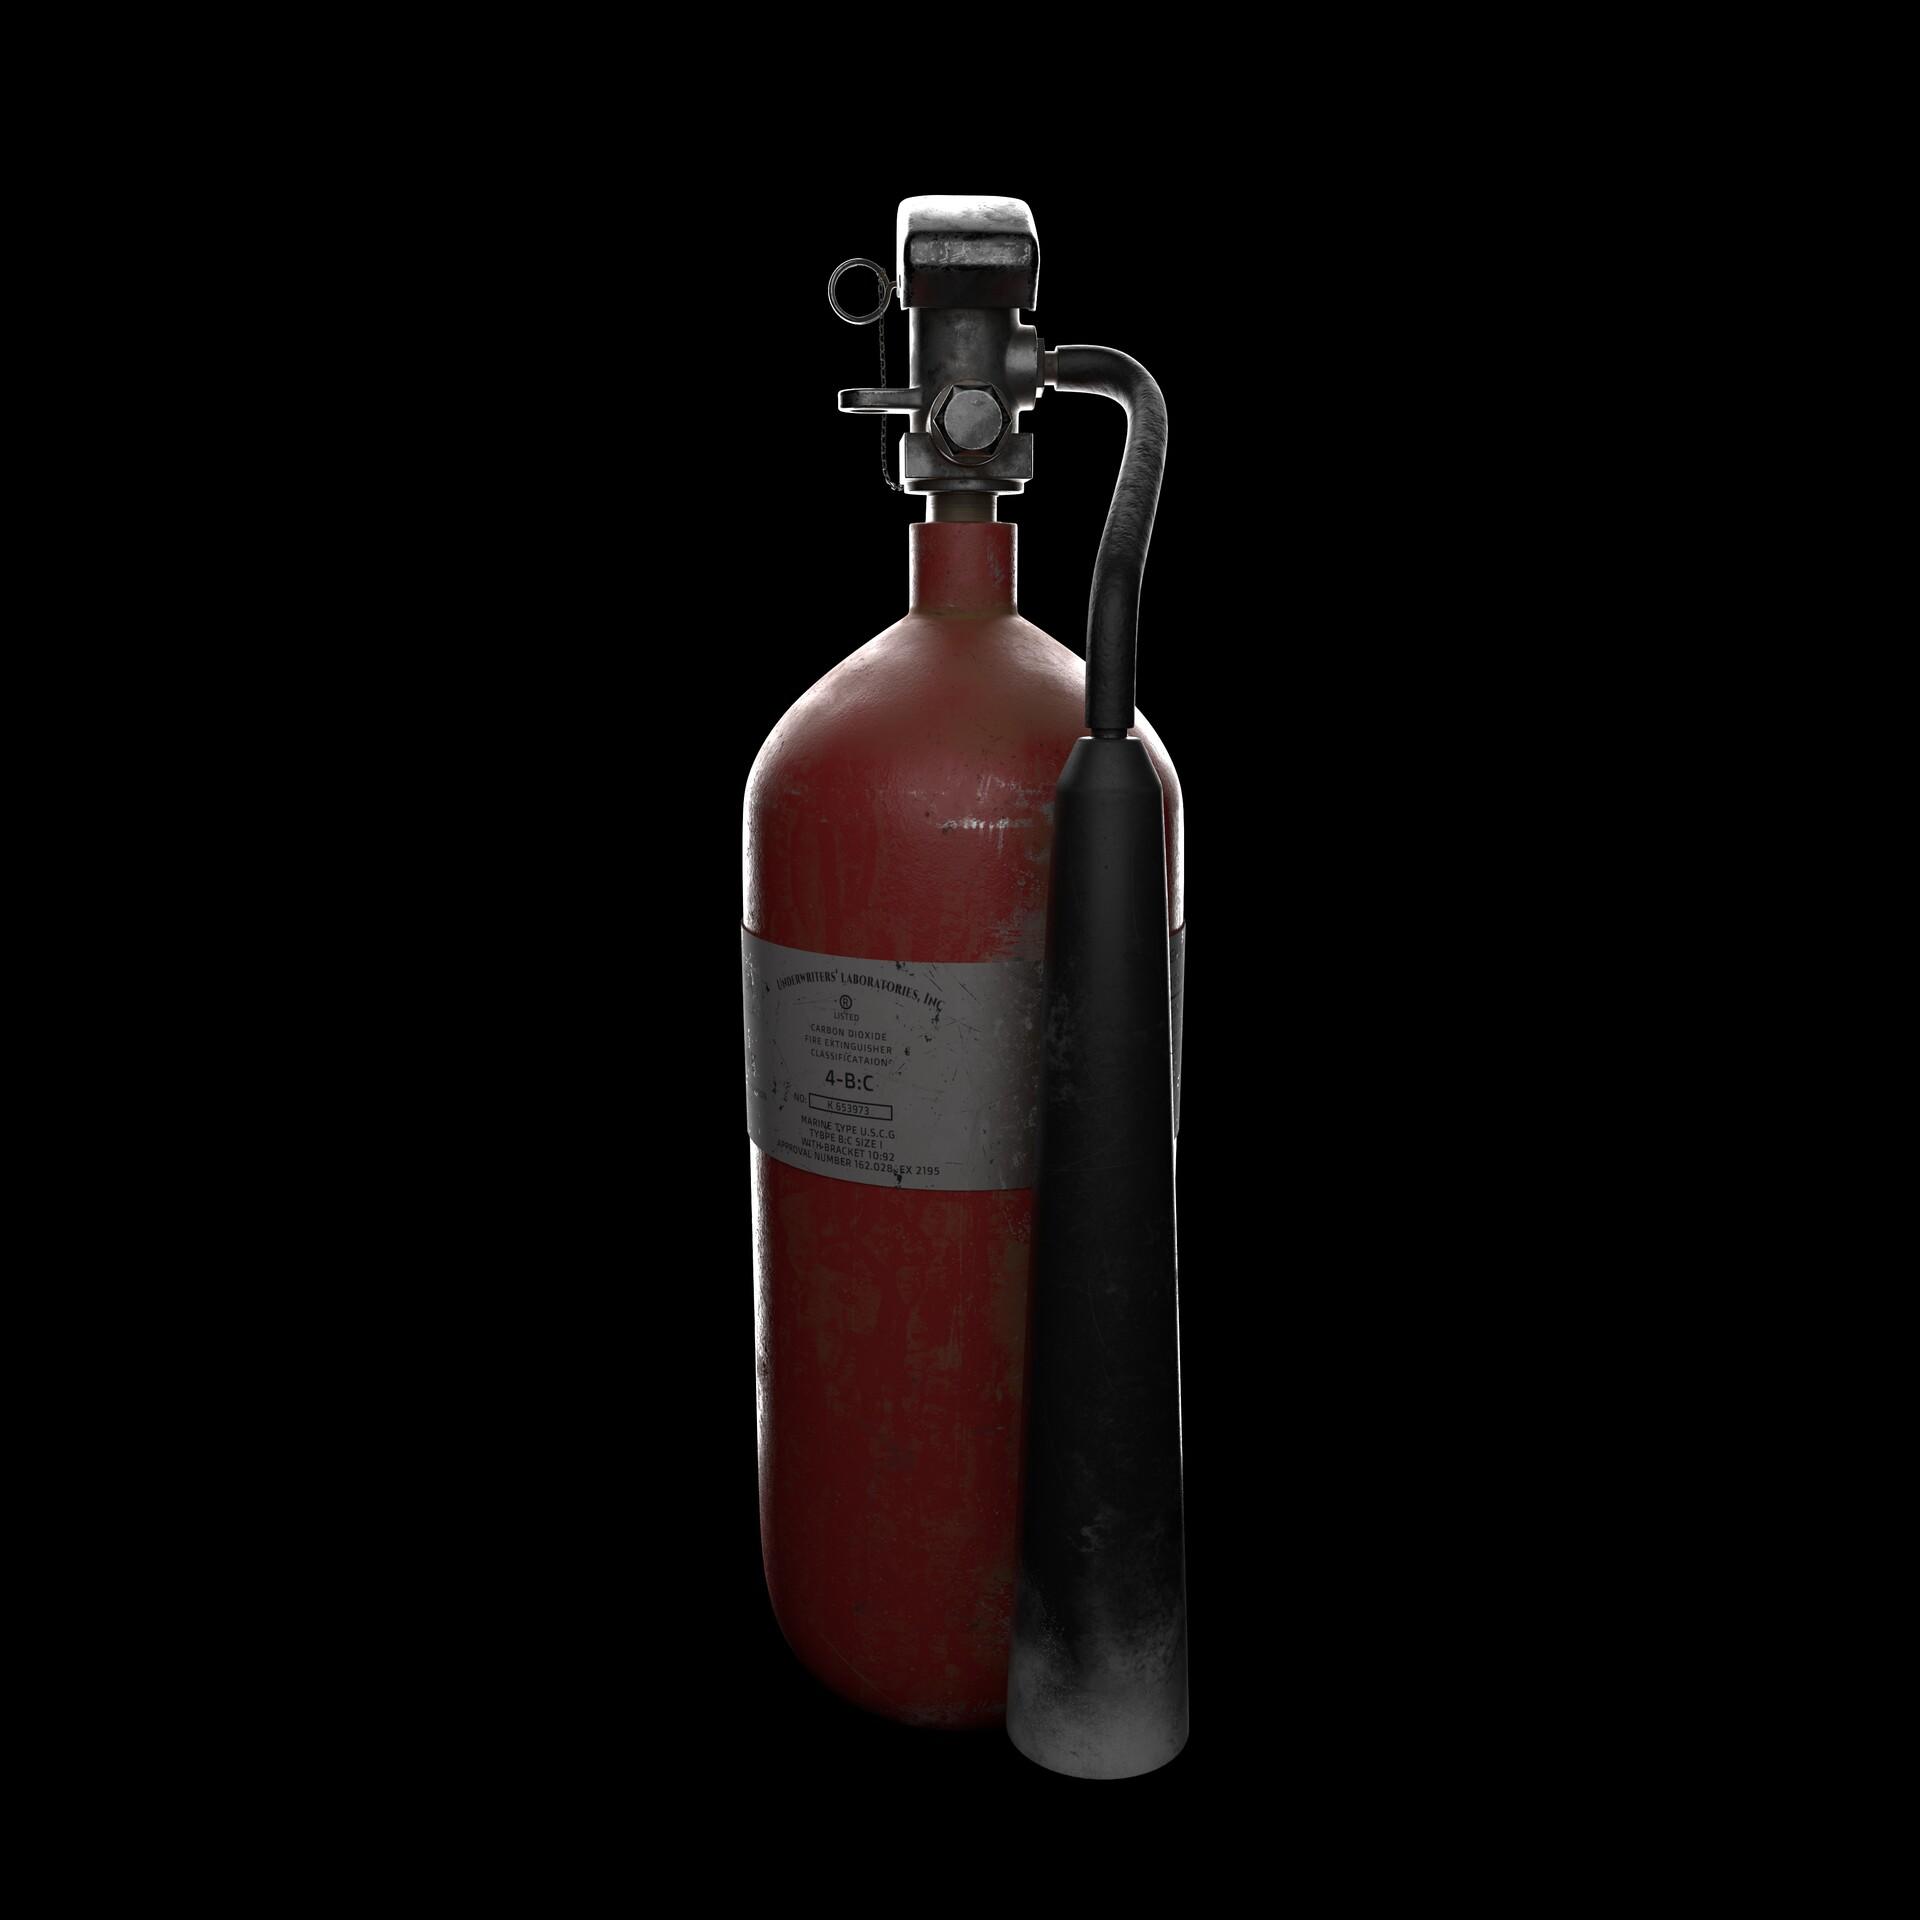 Darko mitev fireextinguisher02